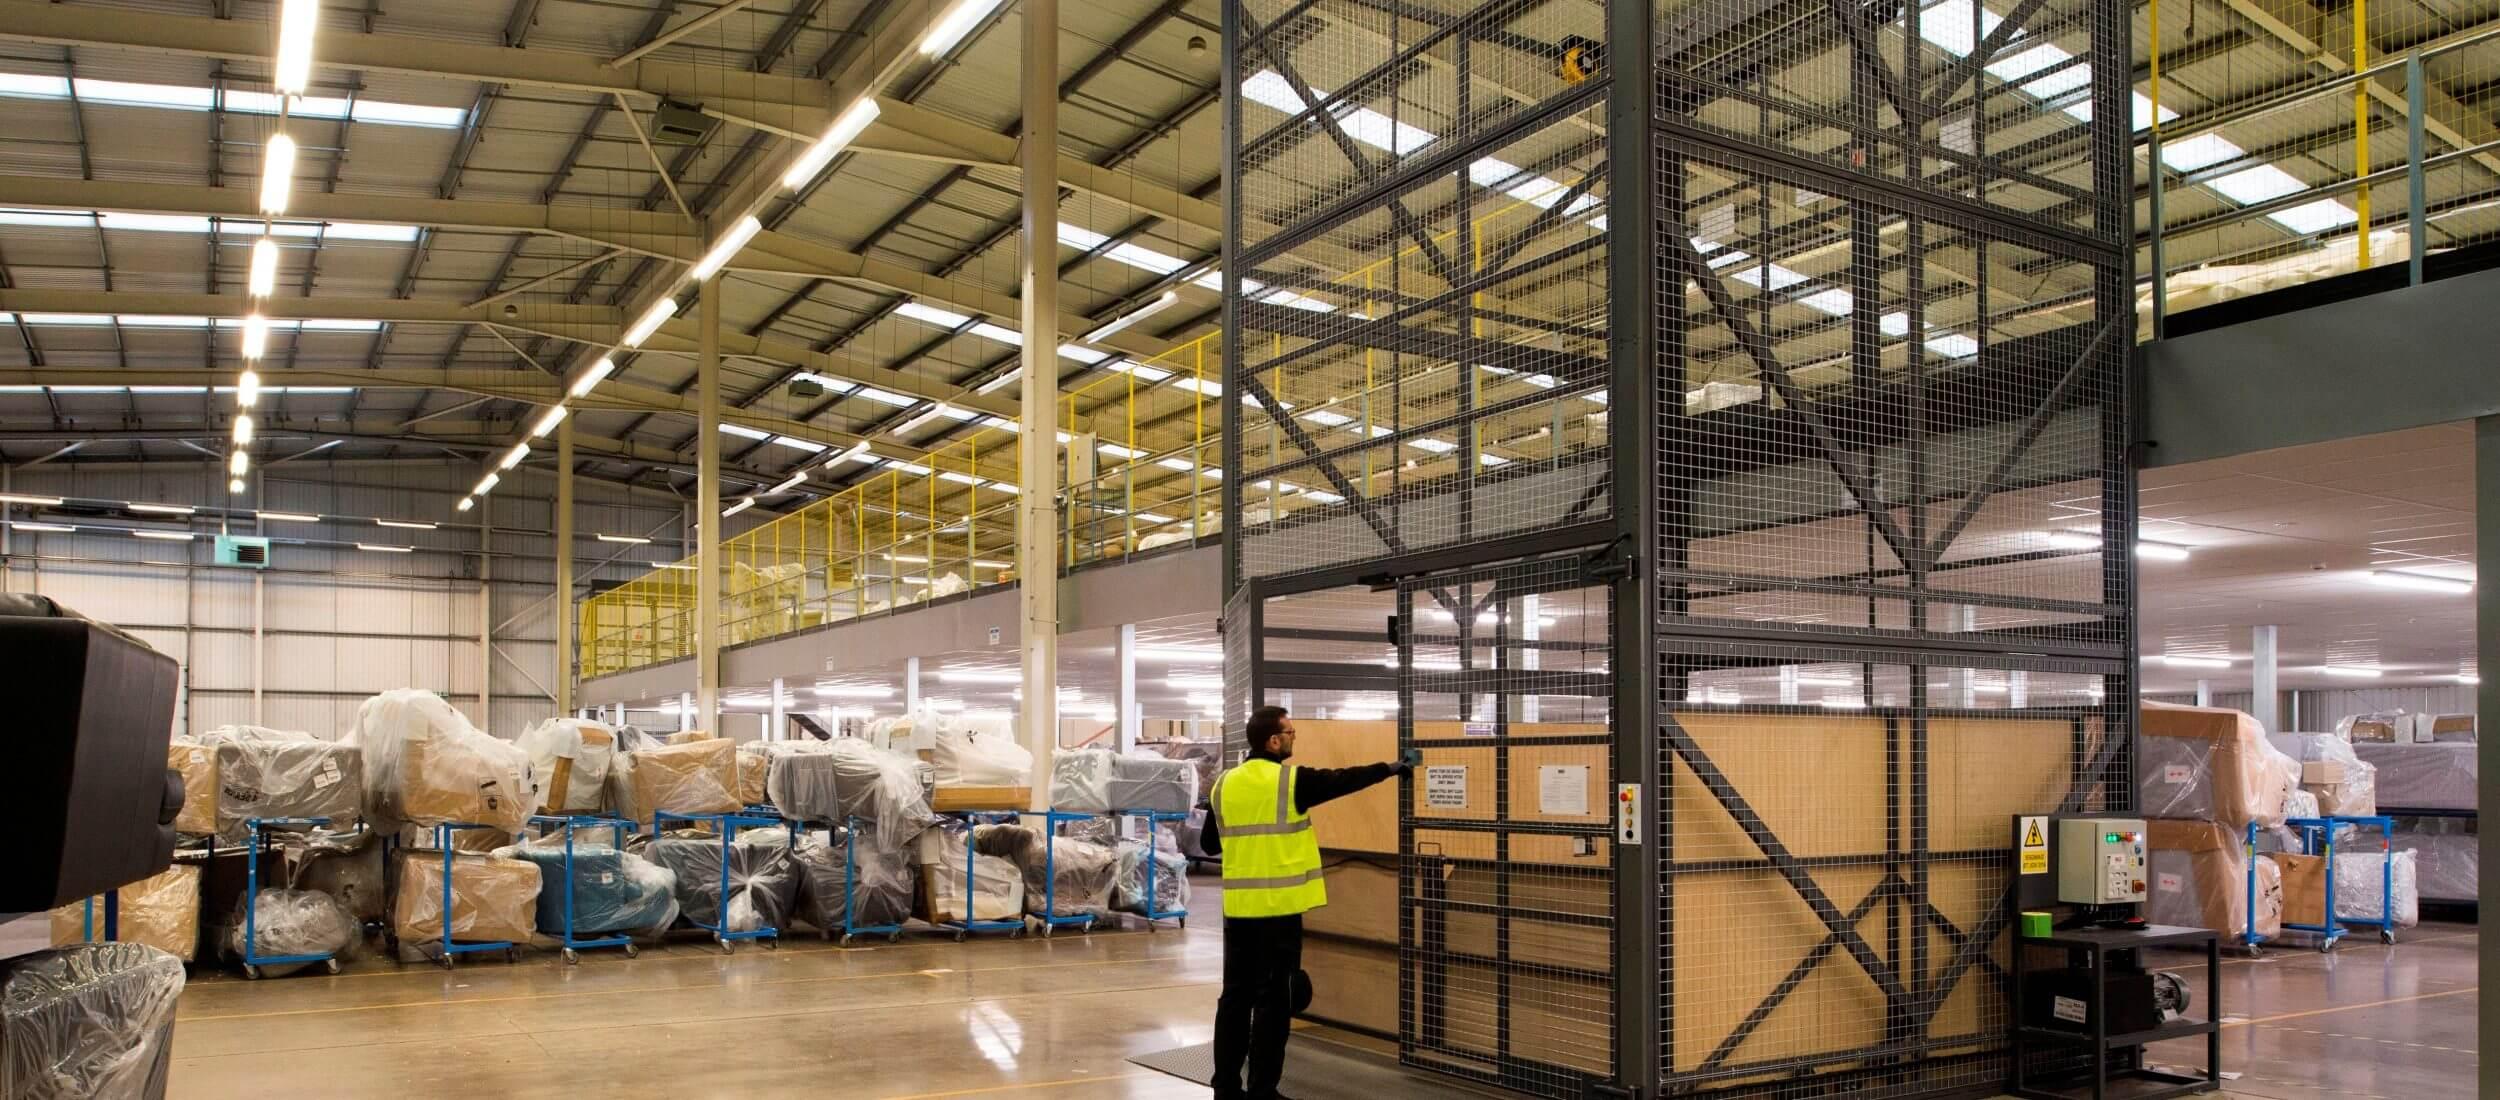 Mezzanine floor lifts in warehouse